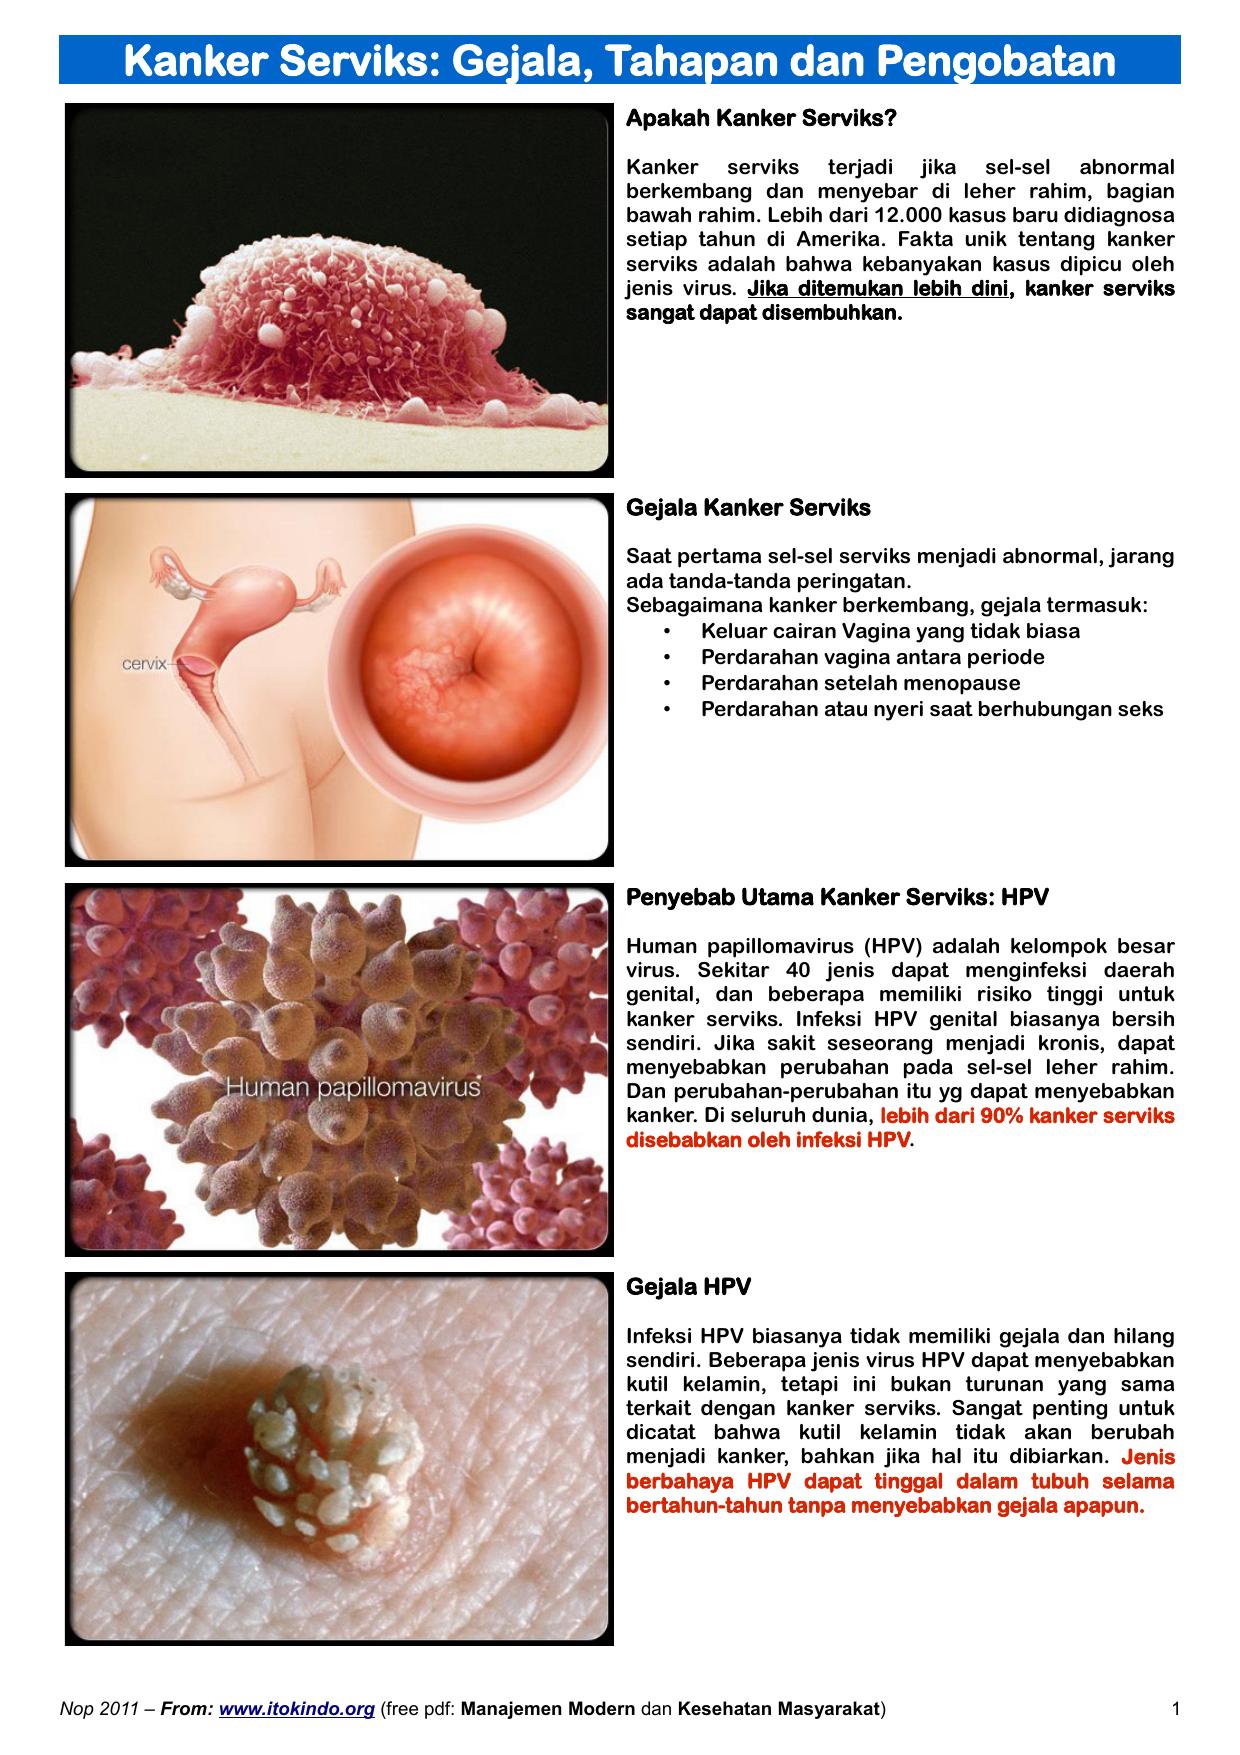 hpv papilloma virus cura squamous papilloma esophagus hpv